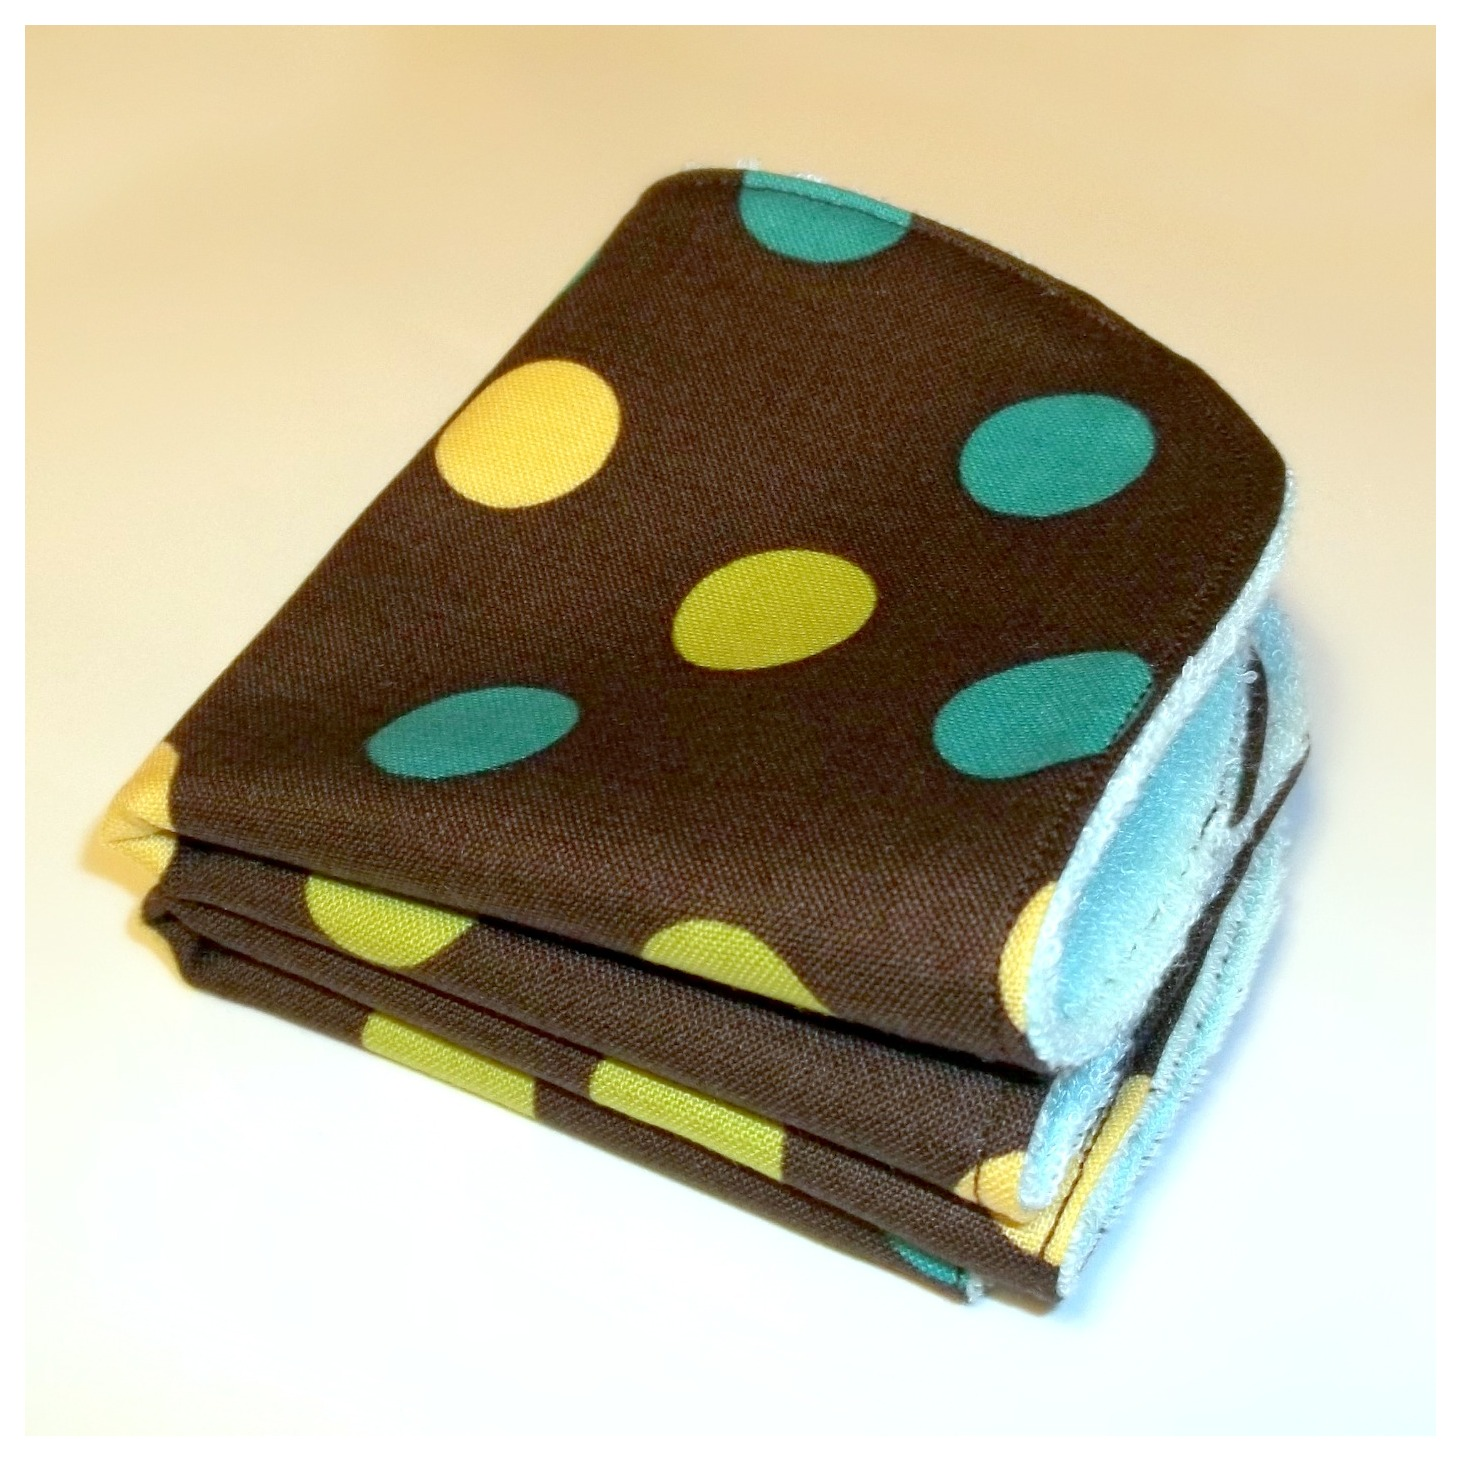 Wash Cloths As Burp Cloths: Lady Create-a-lot: Cute, Matchy Wash Cloths/burp Rags